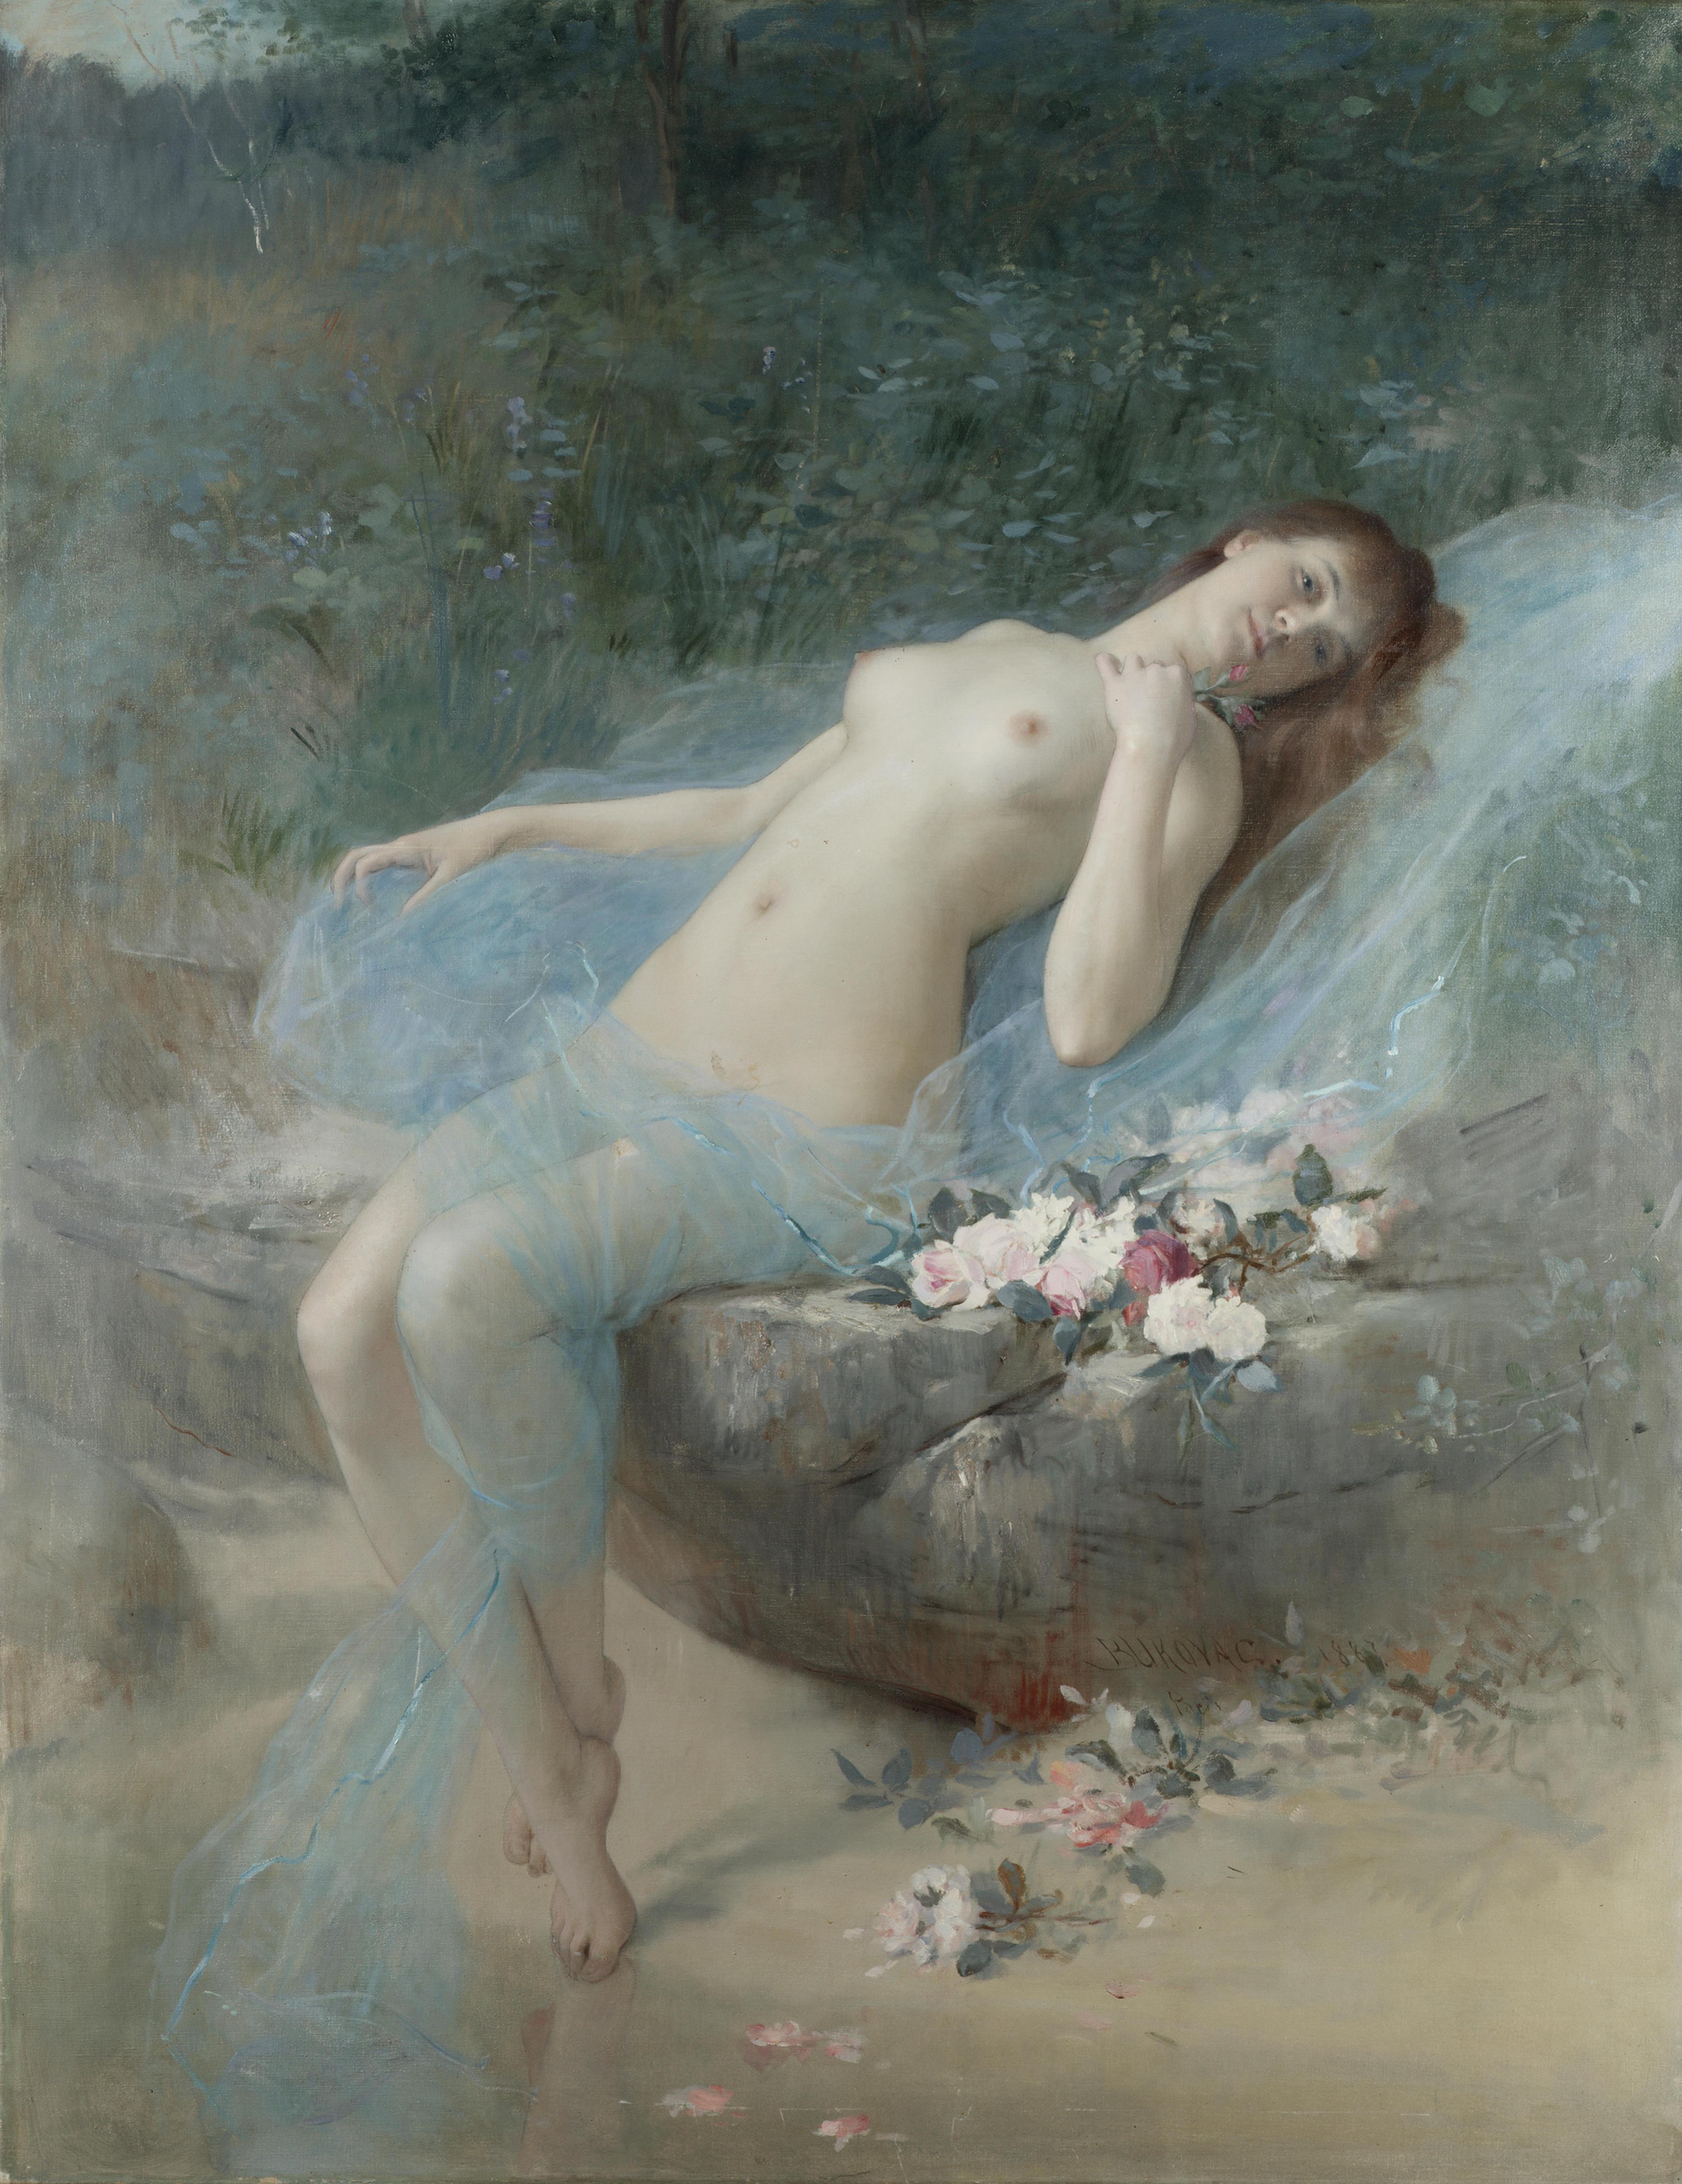 Vlaho Bukovac, 1855-1922. Лежащая обнаженная. 127 x 97 см. Частная коллекция